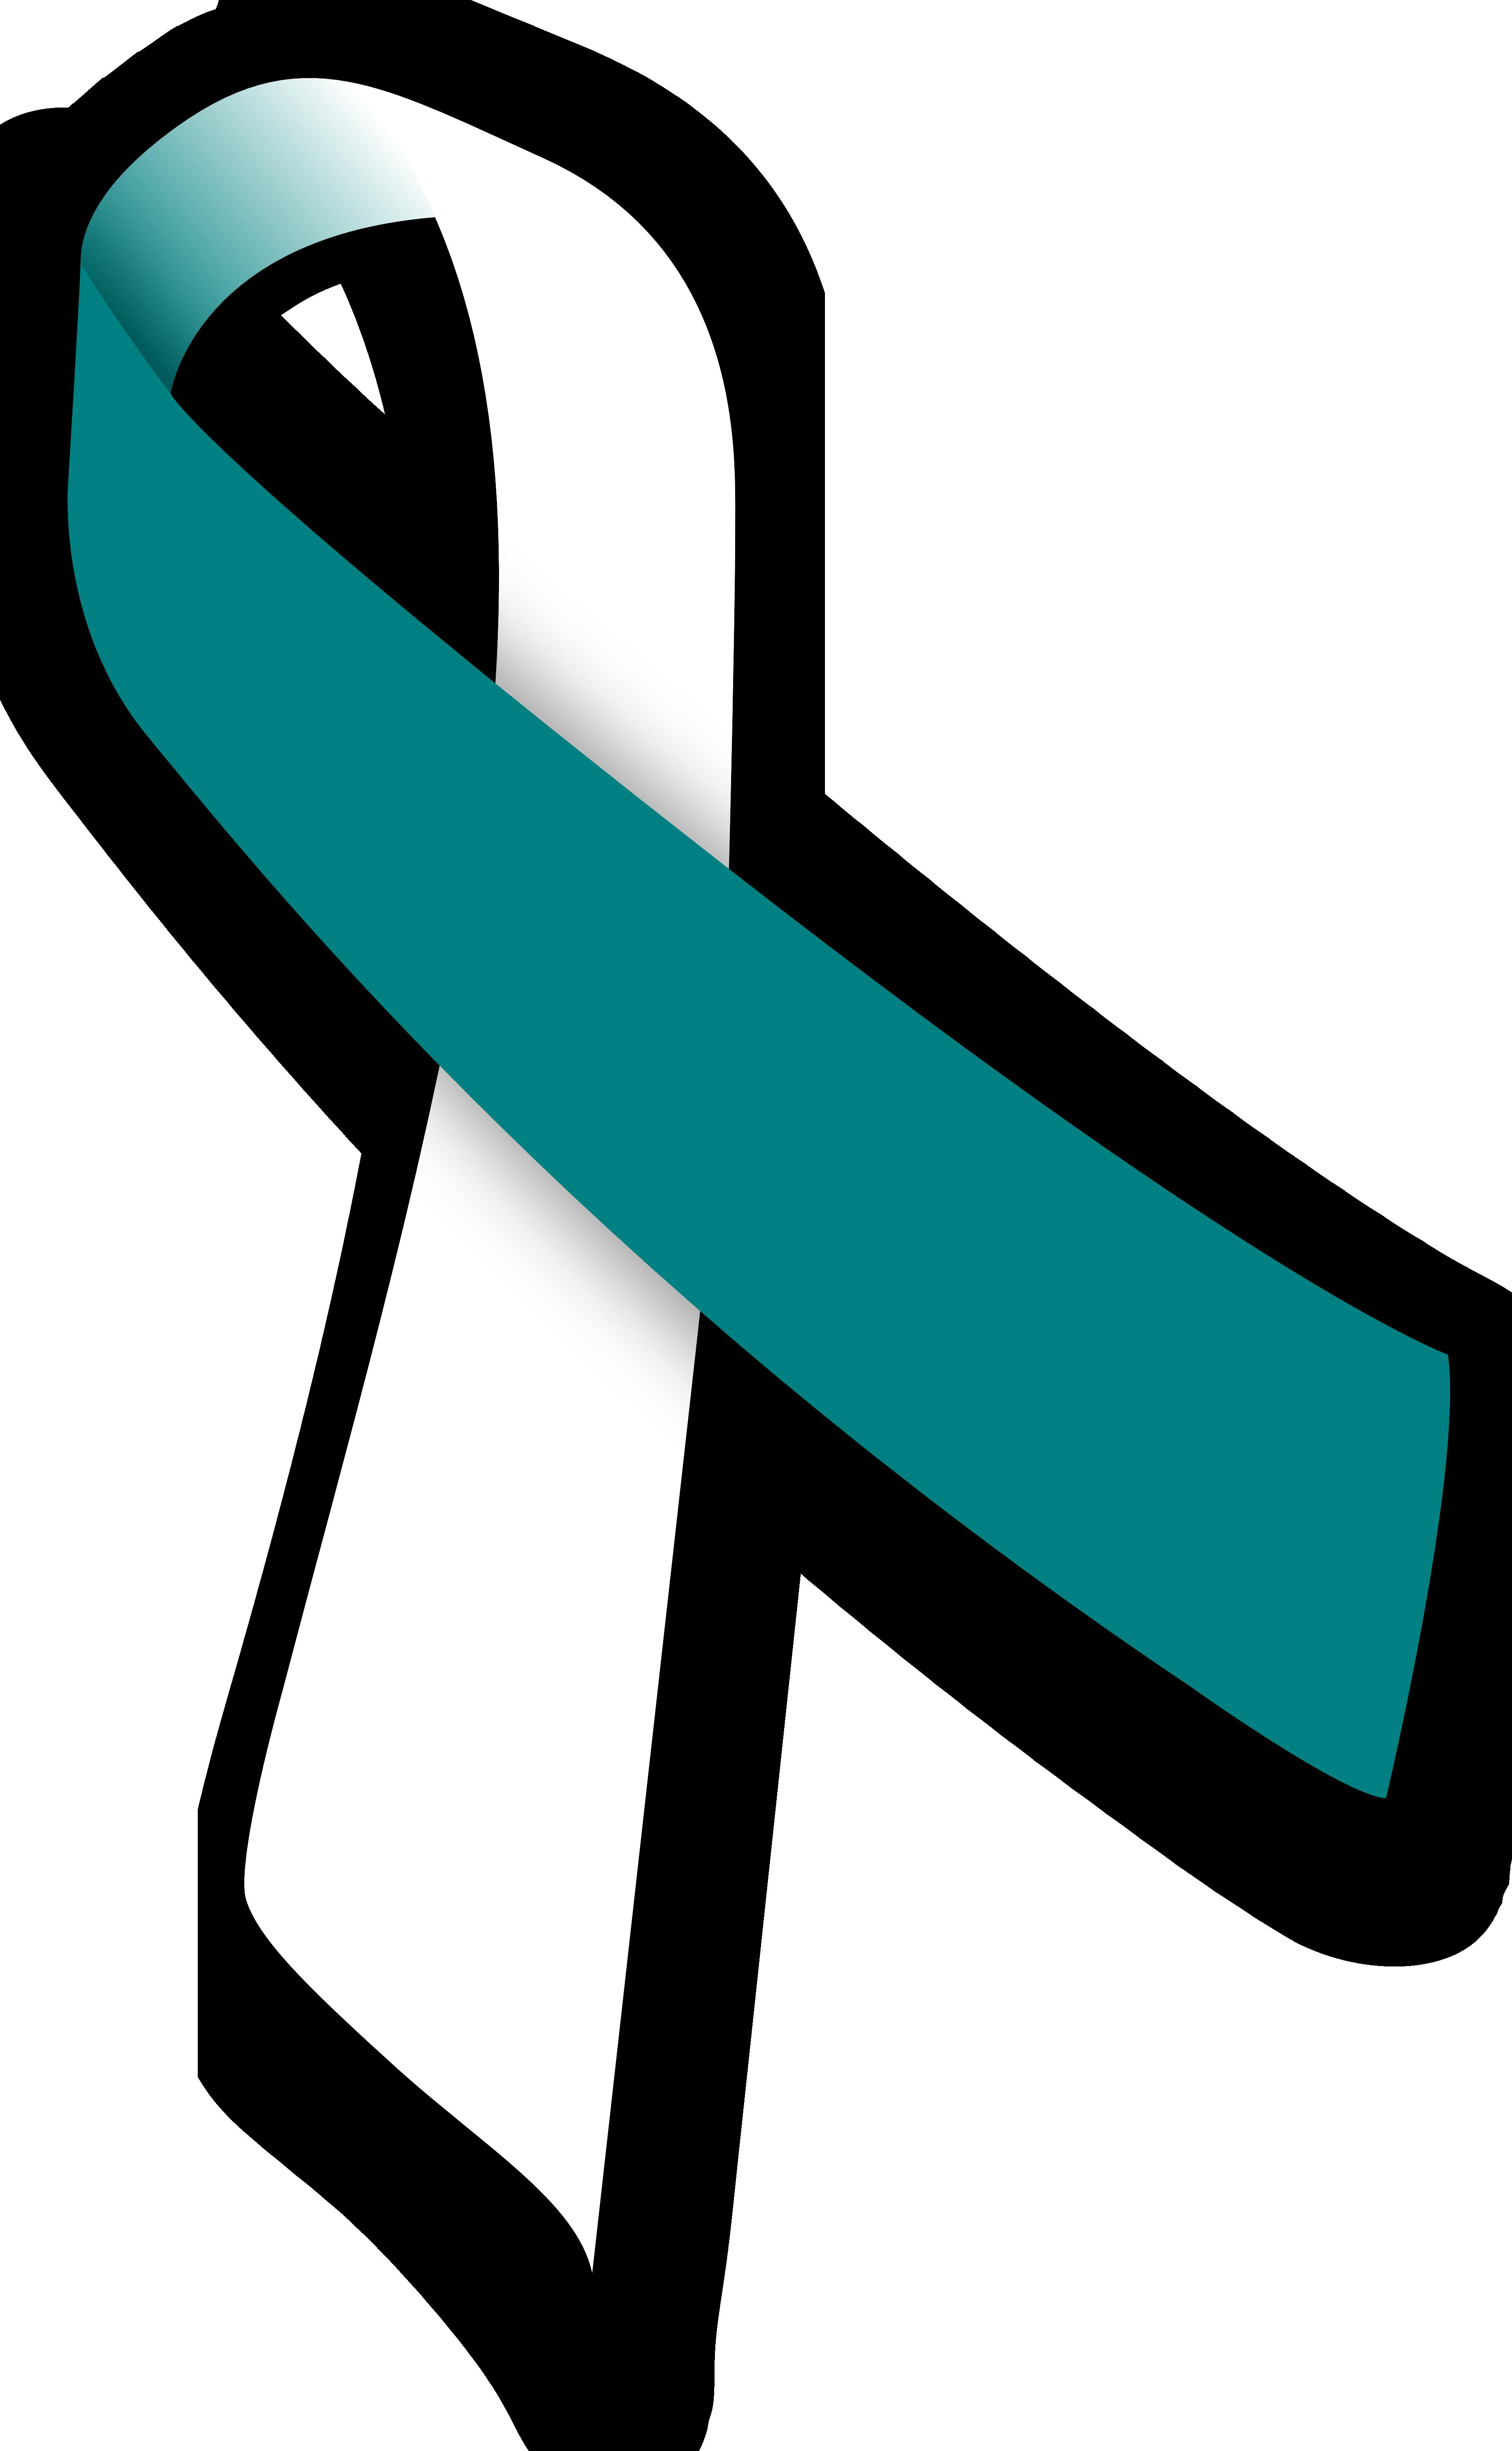 ribbon design huge image  3739 x 6060  file type png Colon Cancer Ribbon Color colon cancer ribbon clip art free